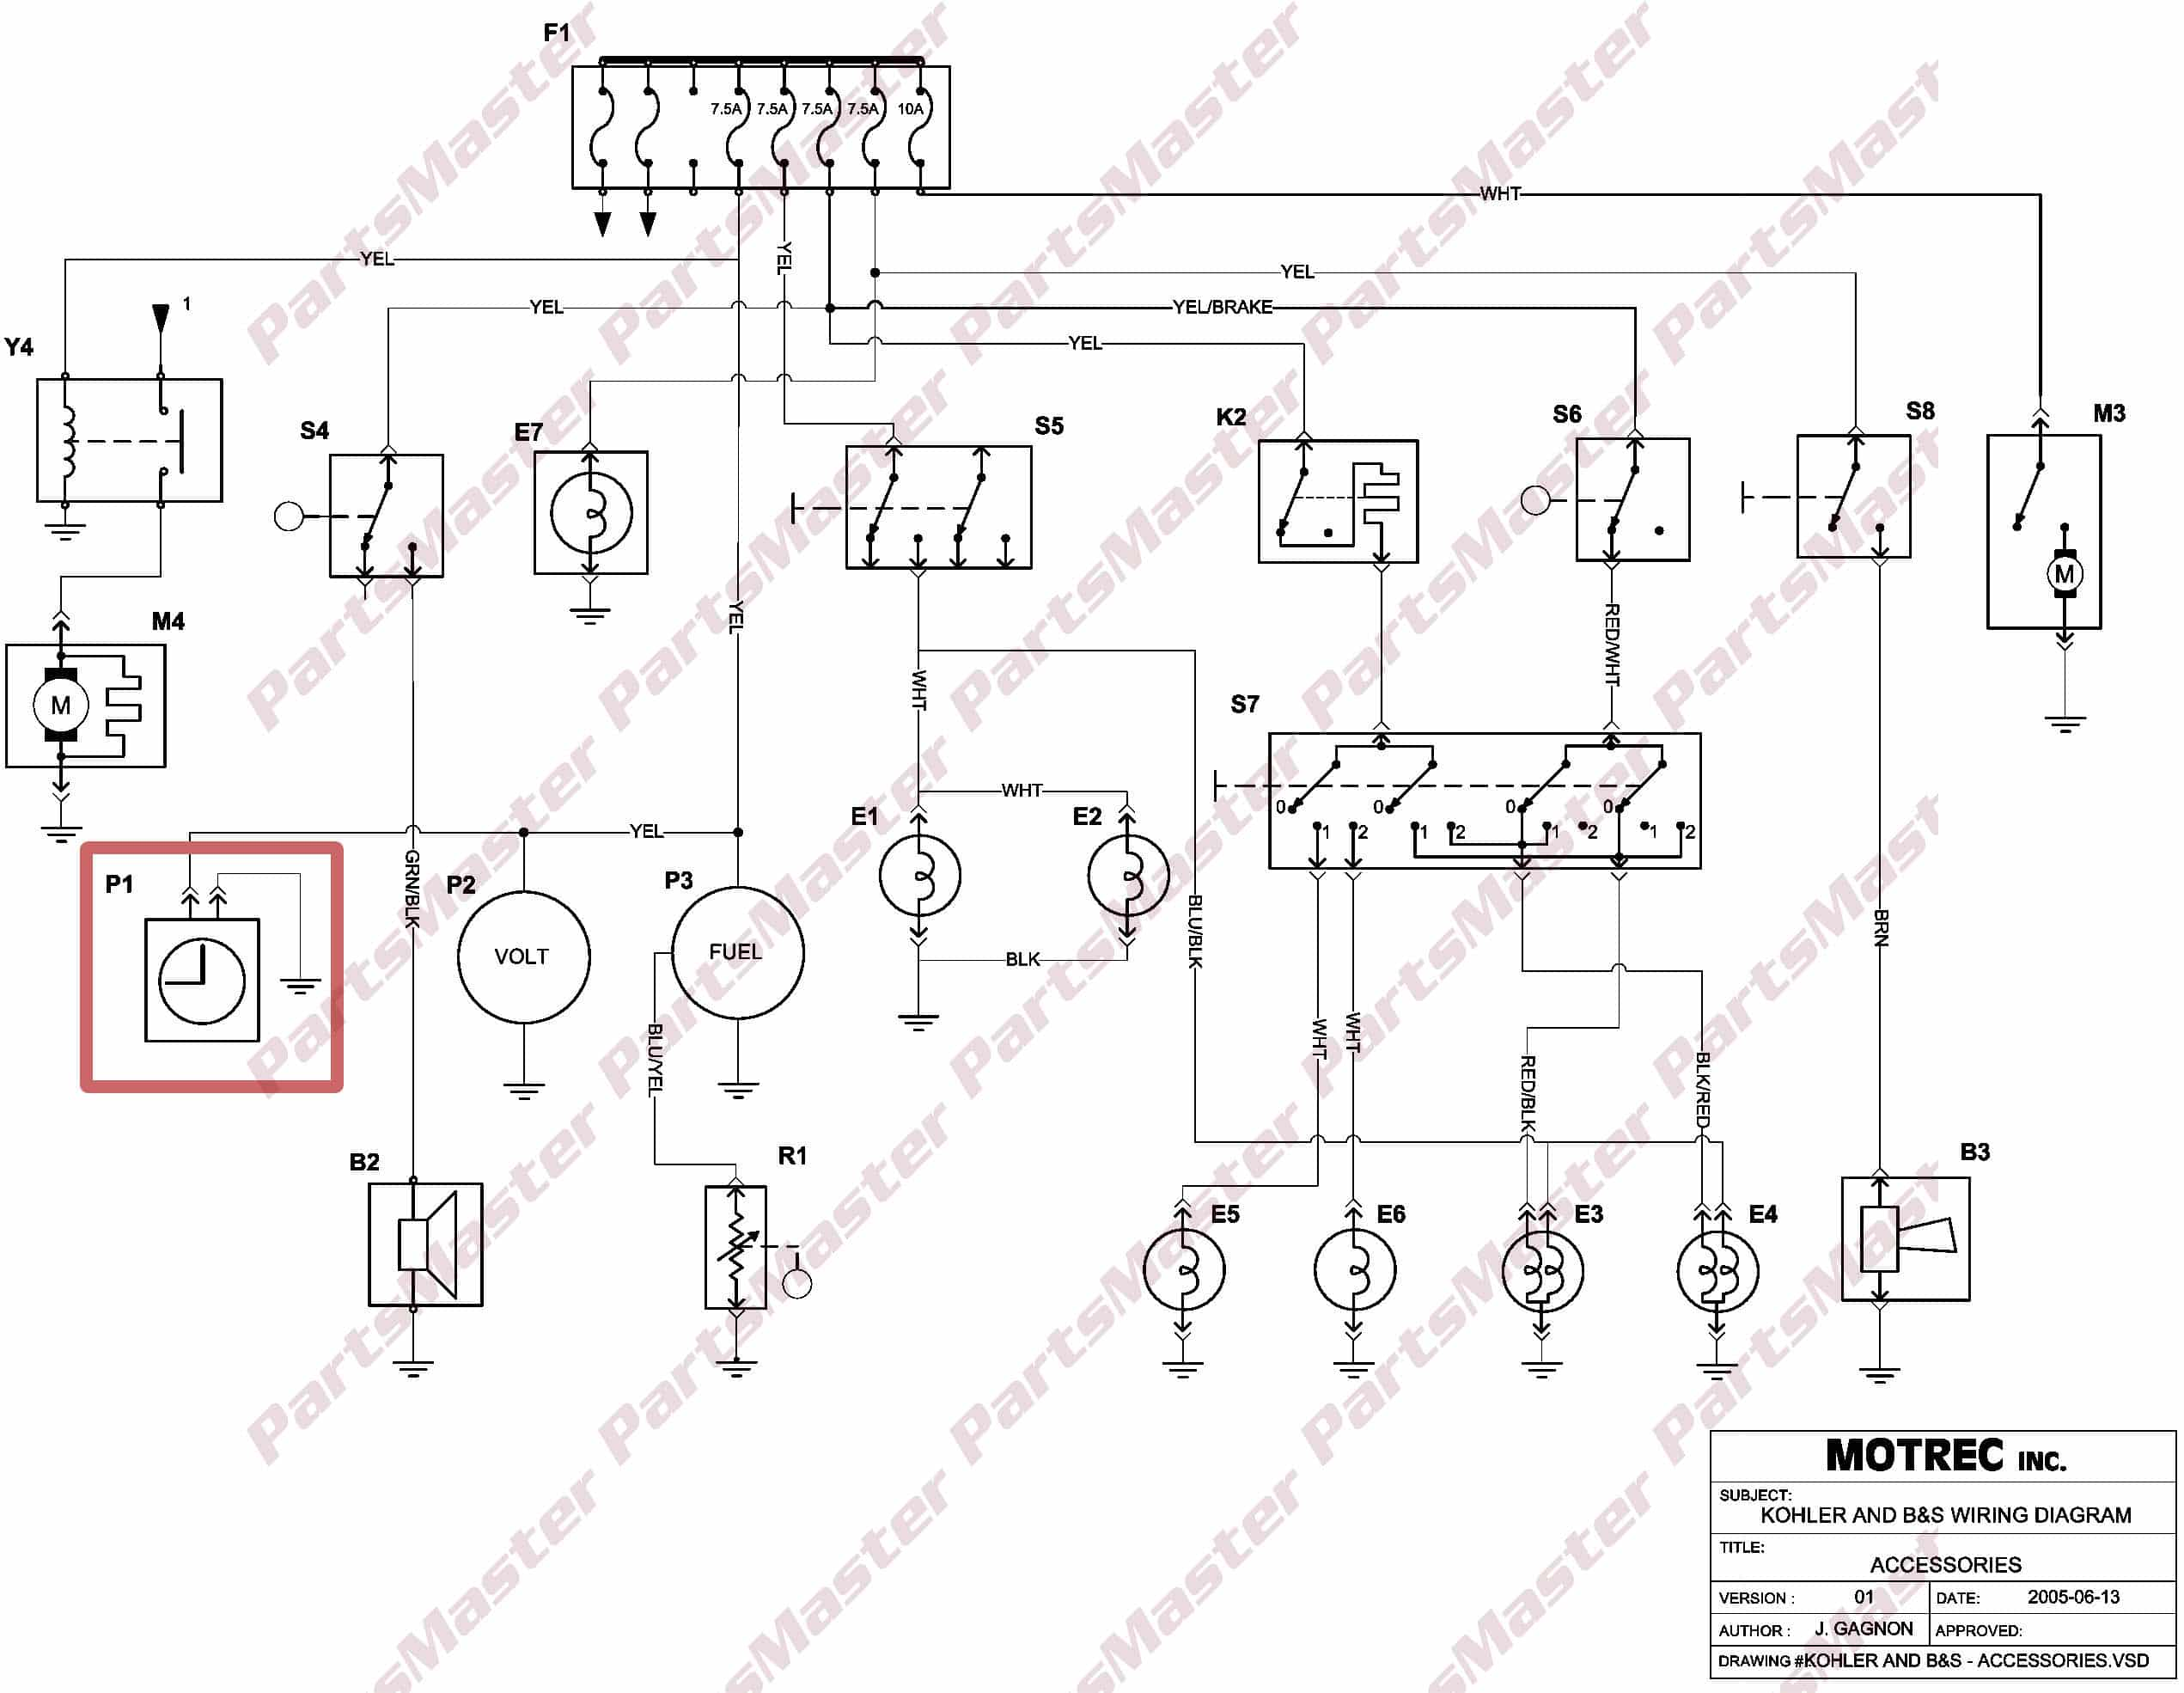 S14 Wiring Diagram Cab Detailed Schematics T1 Library Of U2022